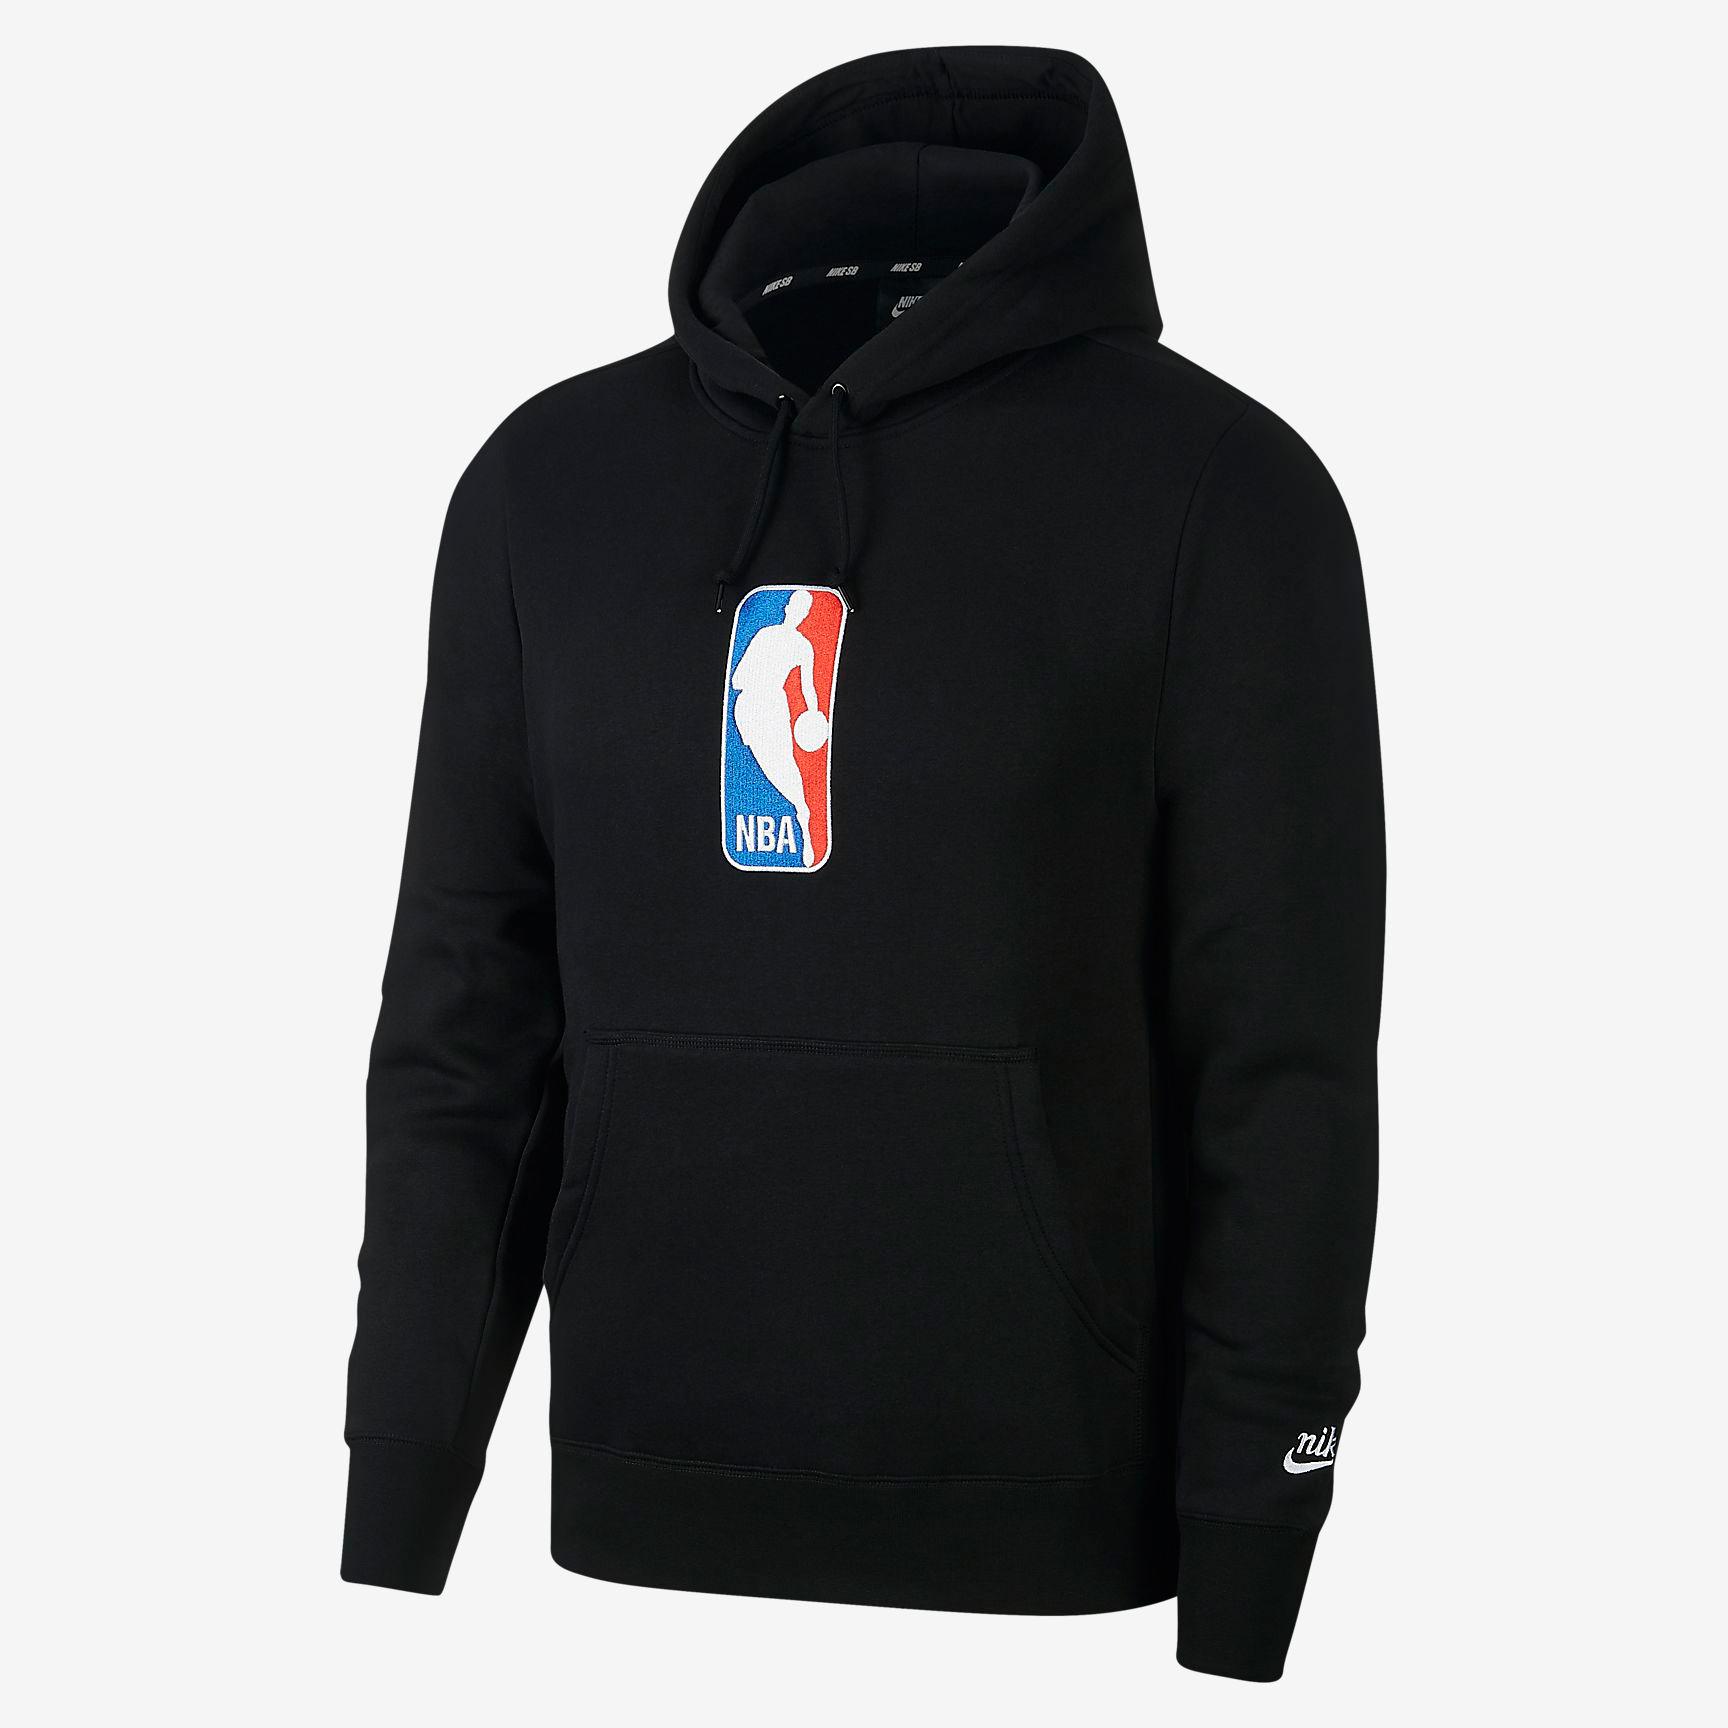 nike-sb-nba-black-hoodie-1